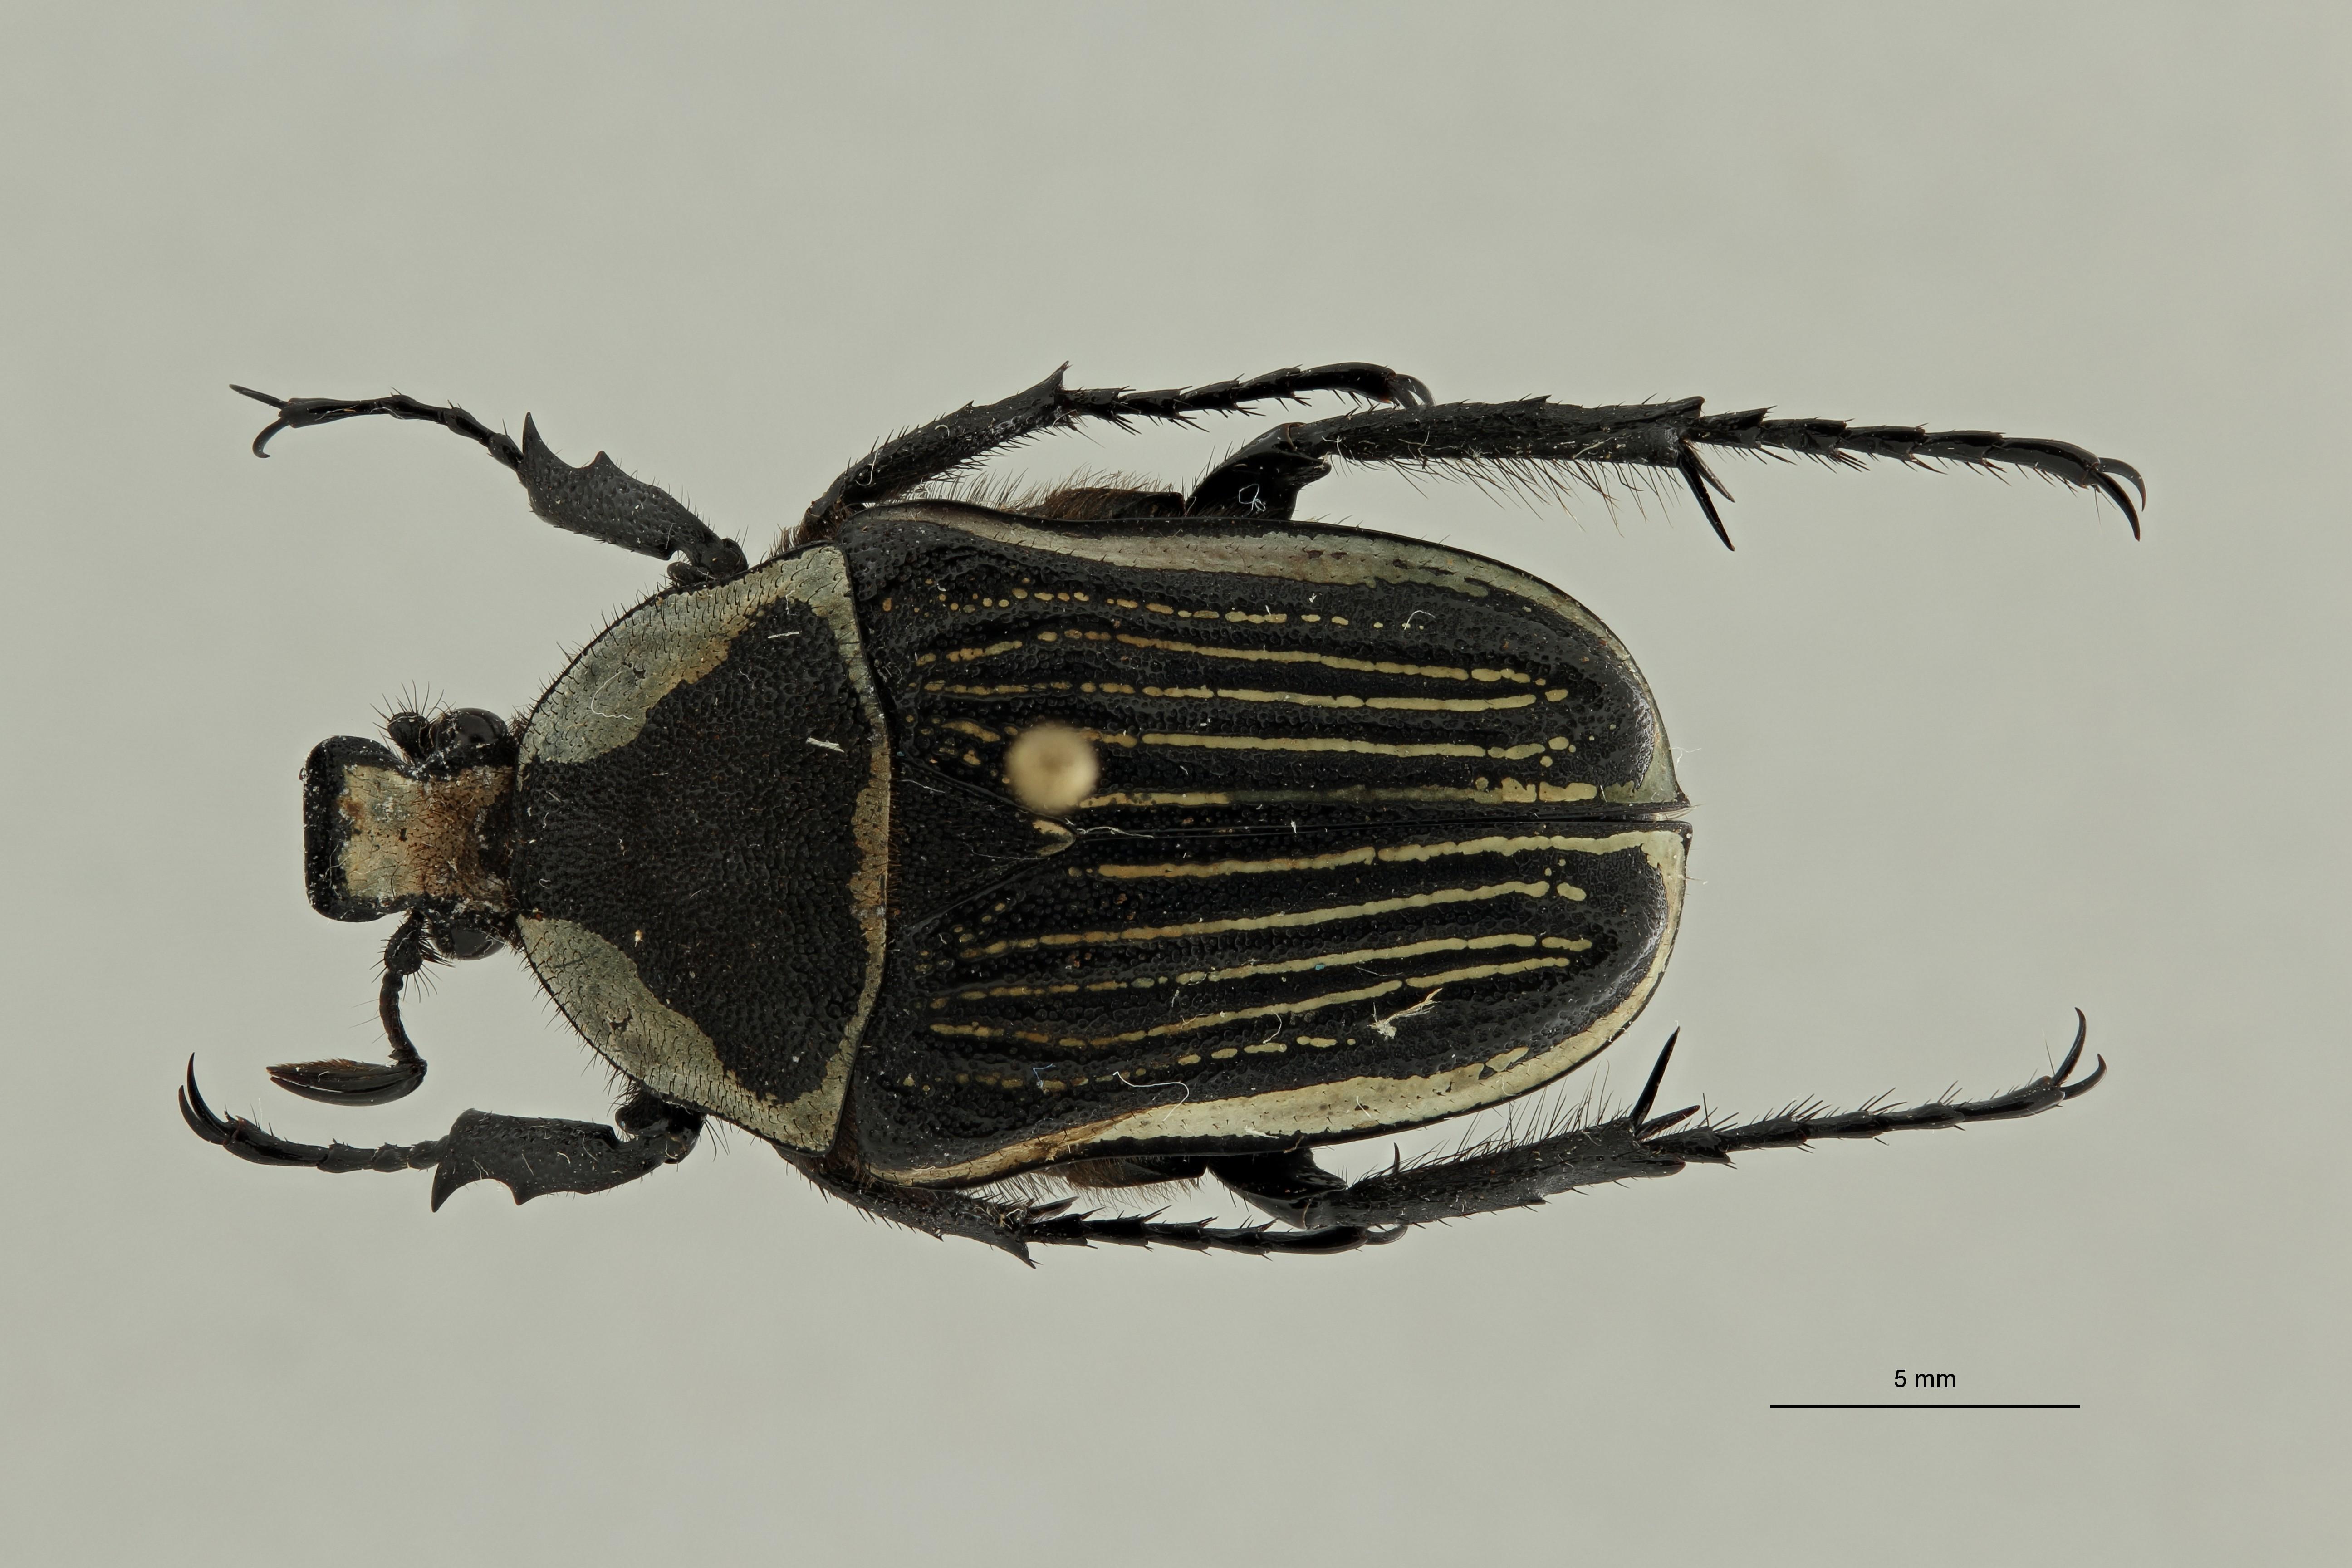 Lansbergia (Trapezorrhina) sordida albolineata pt 1 D ZS PMax Scaled.jpeg